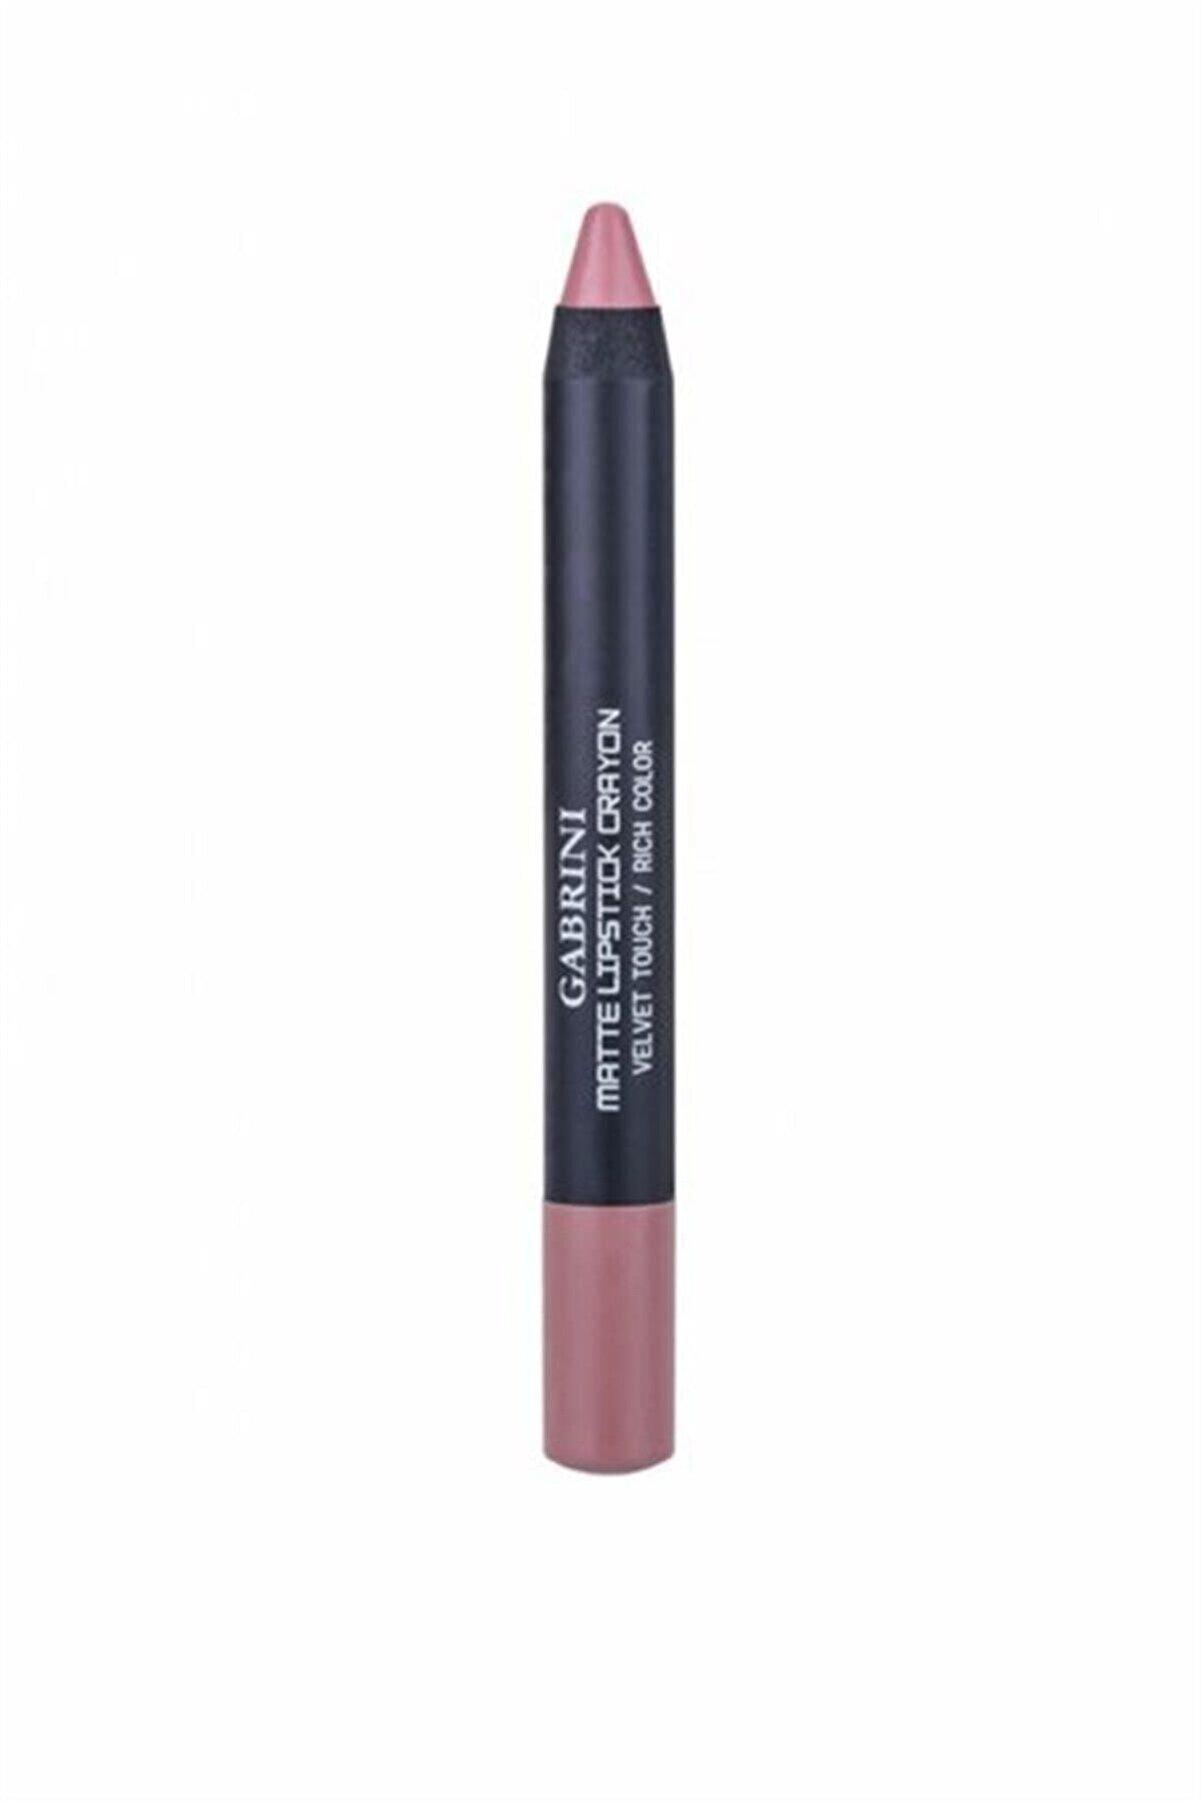 Gabrini Mat Ruj - Matte Lipstick Crayon 02 8696814090027